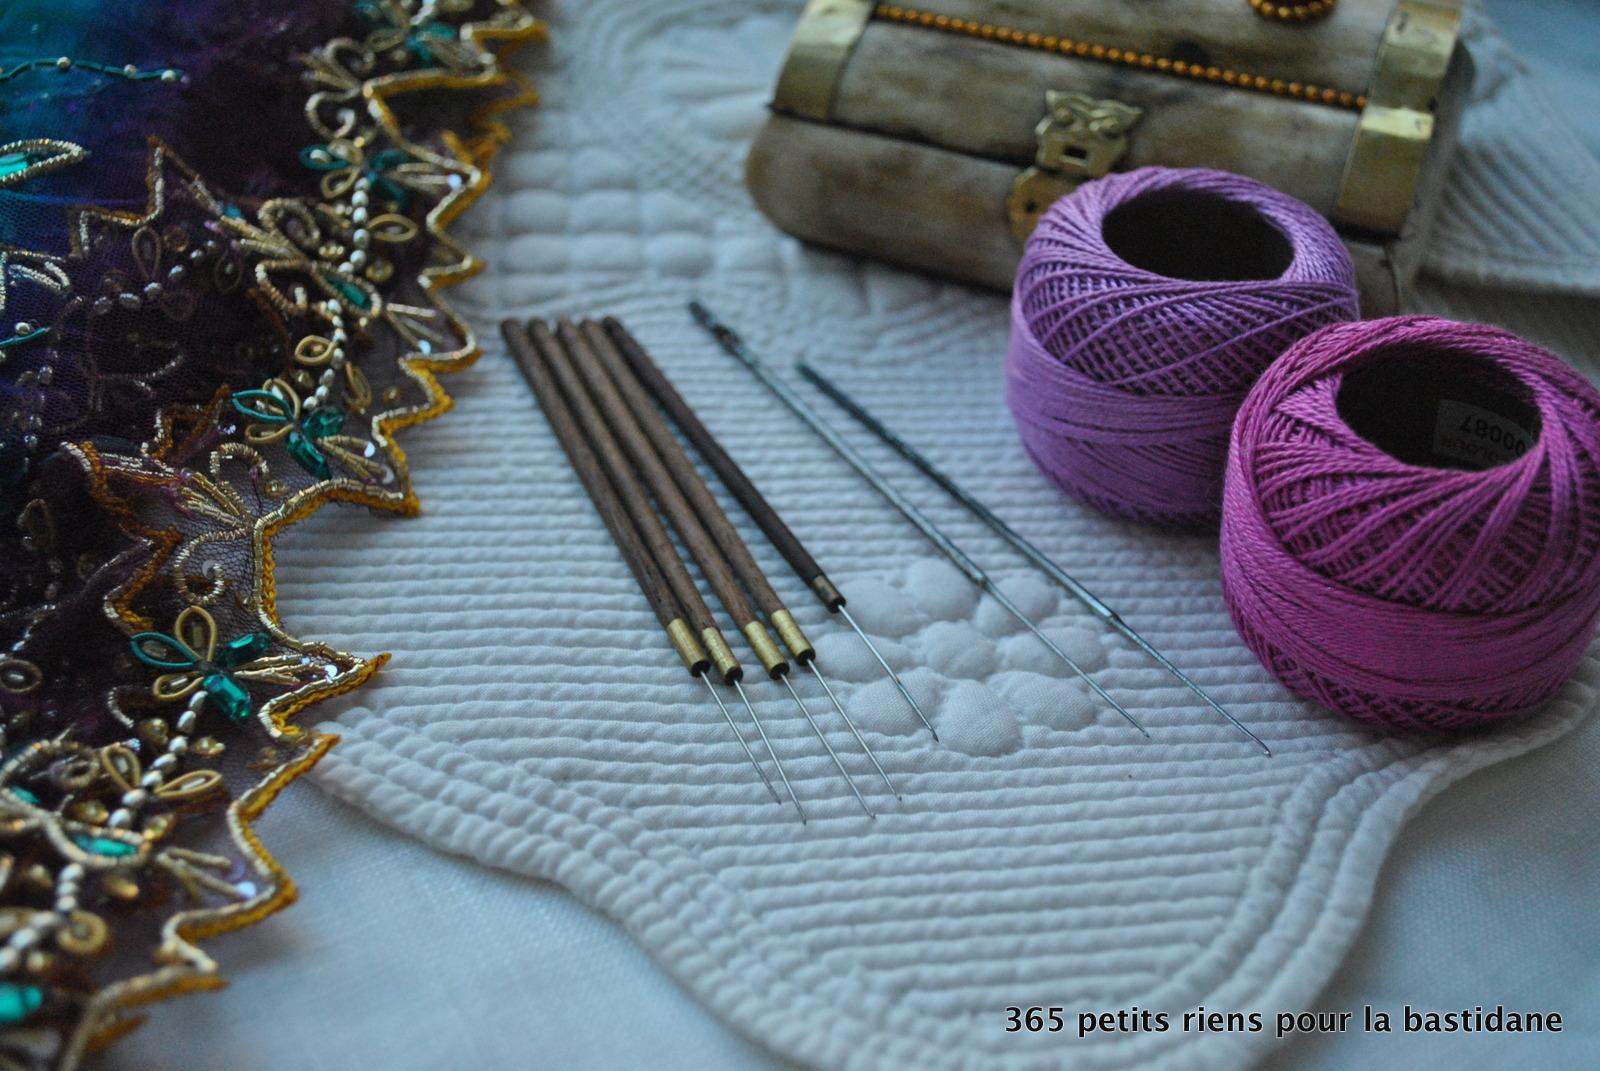 Indian embroidery les petits riens de la bastidane for Machine a coudre 974